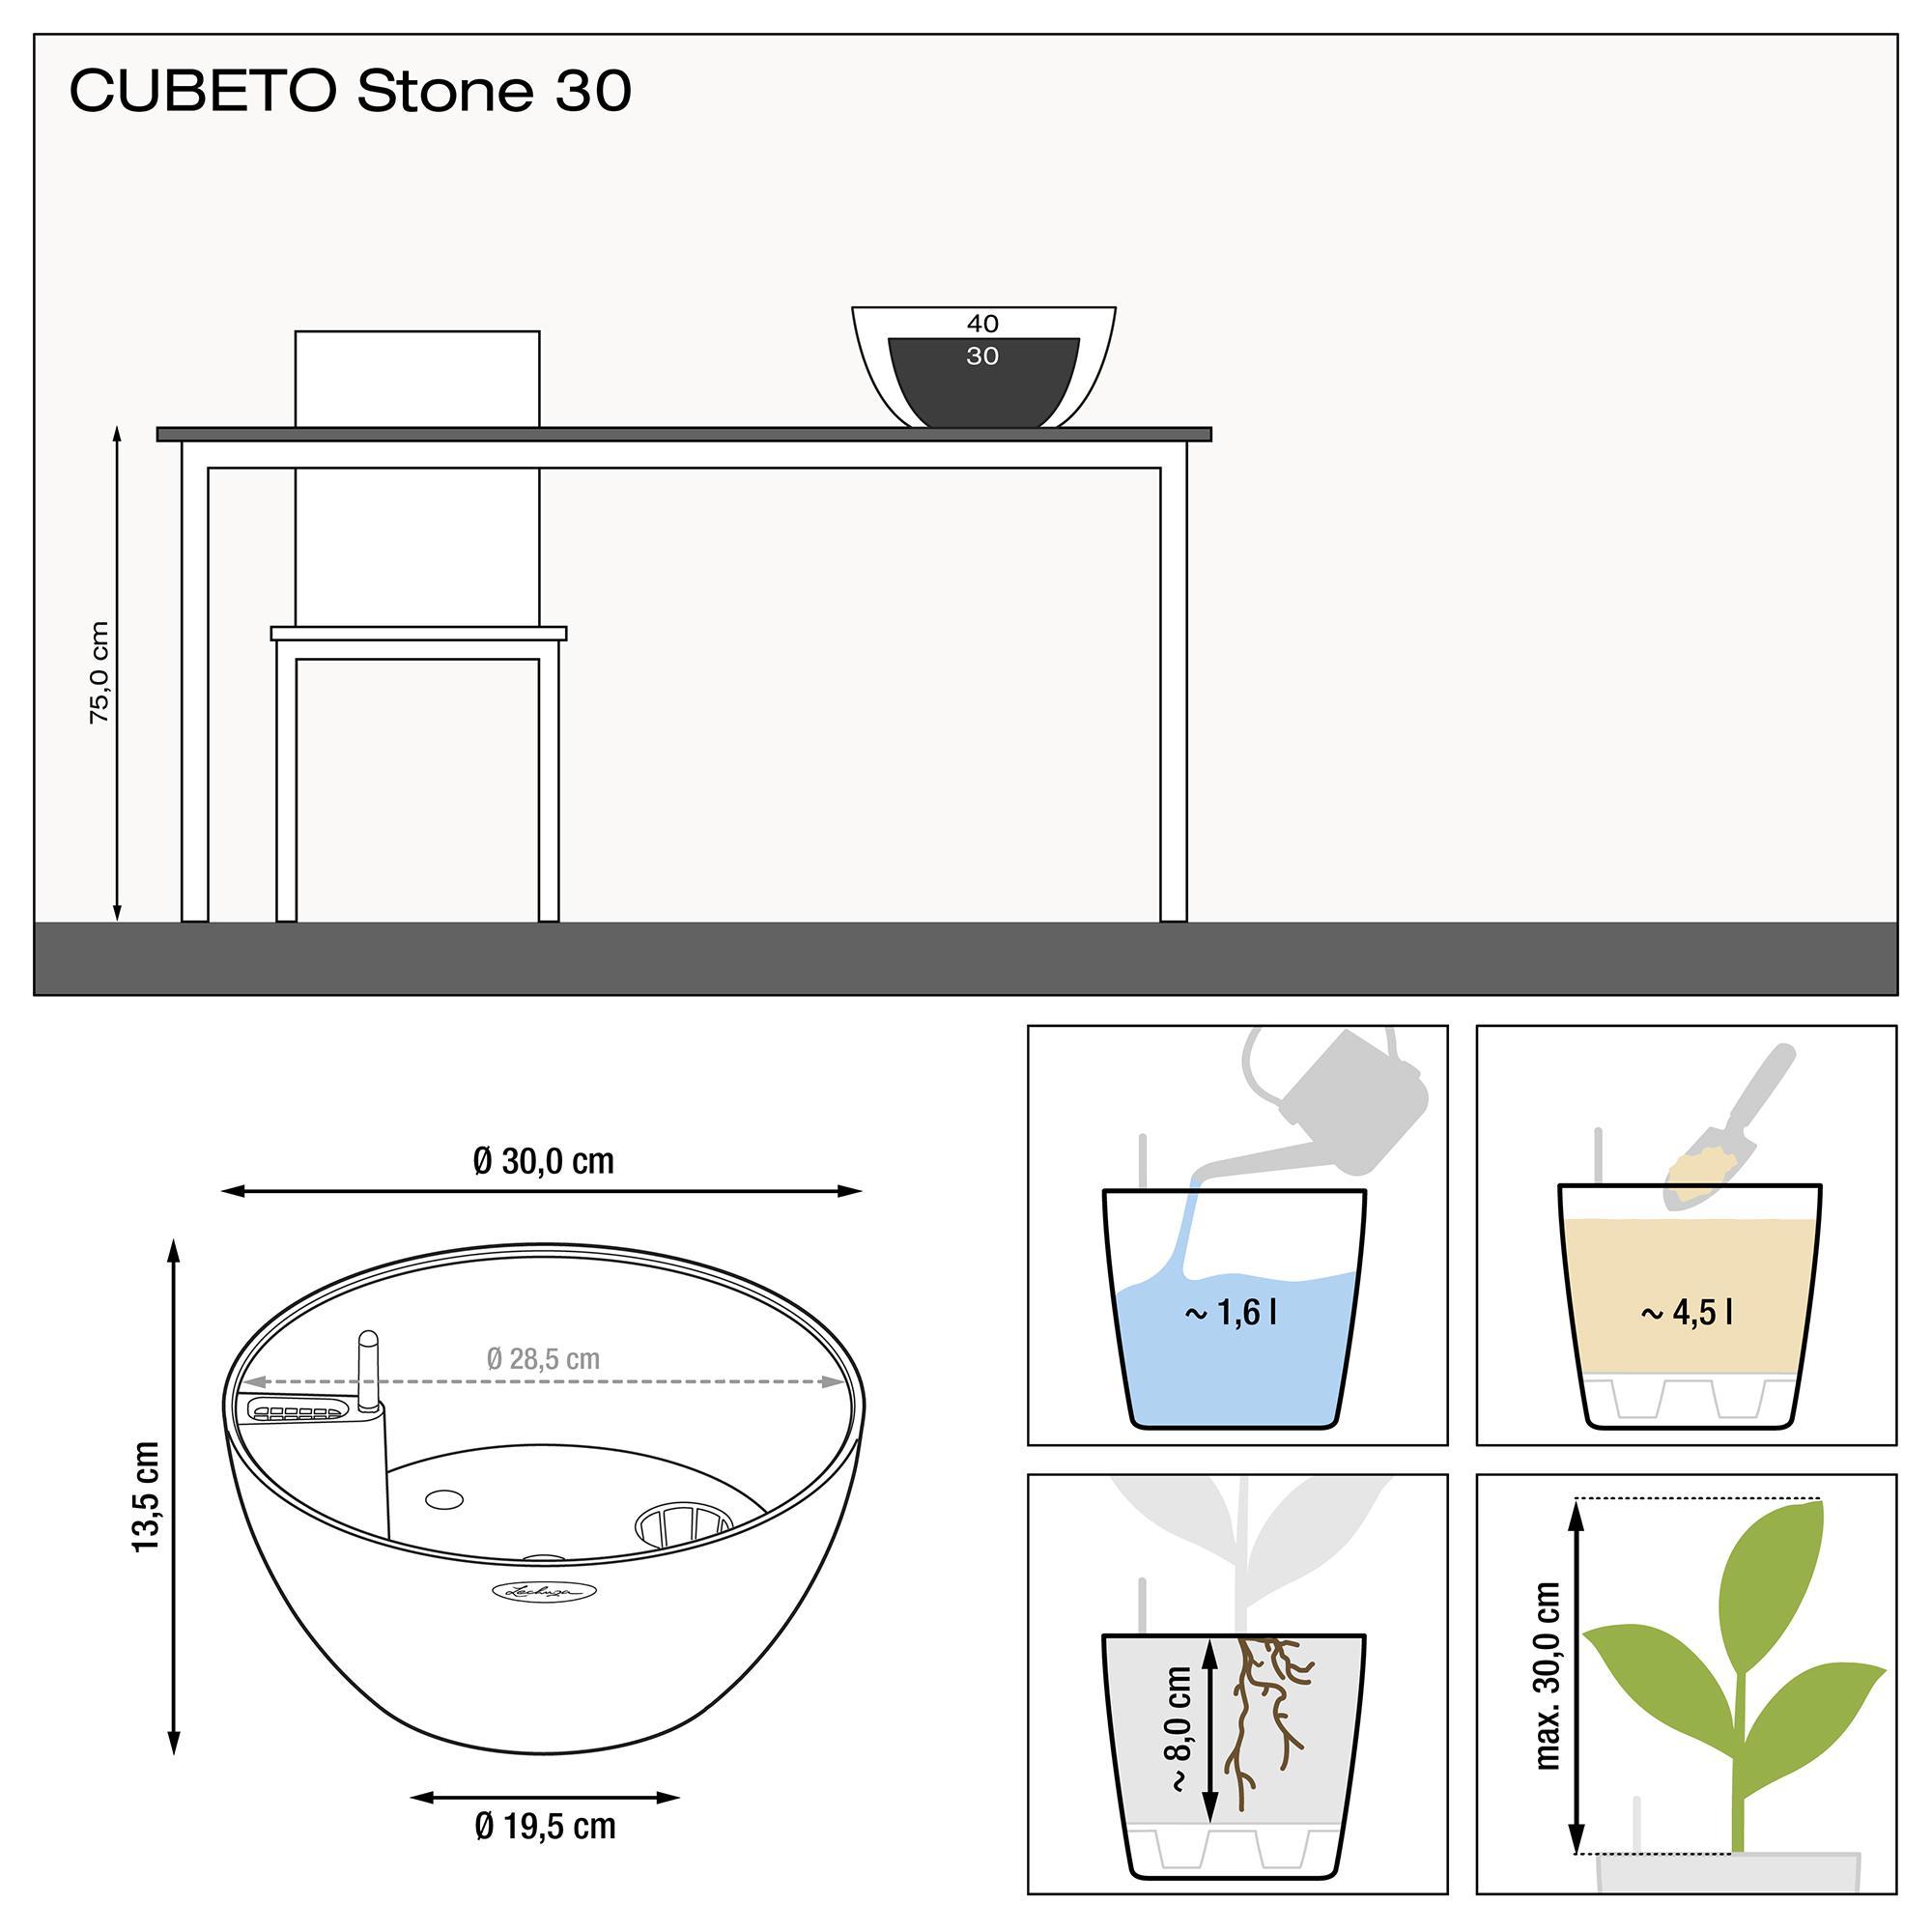 le_cubeto-stone30_product_addi_nz